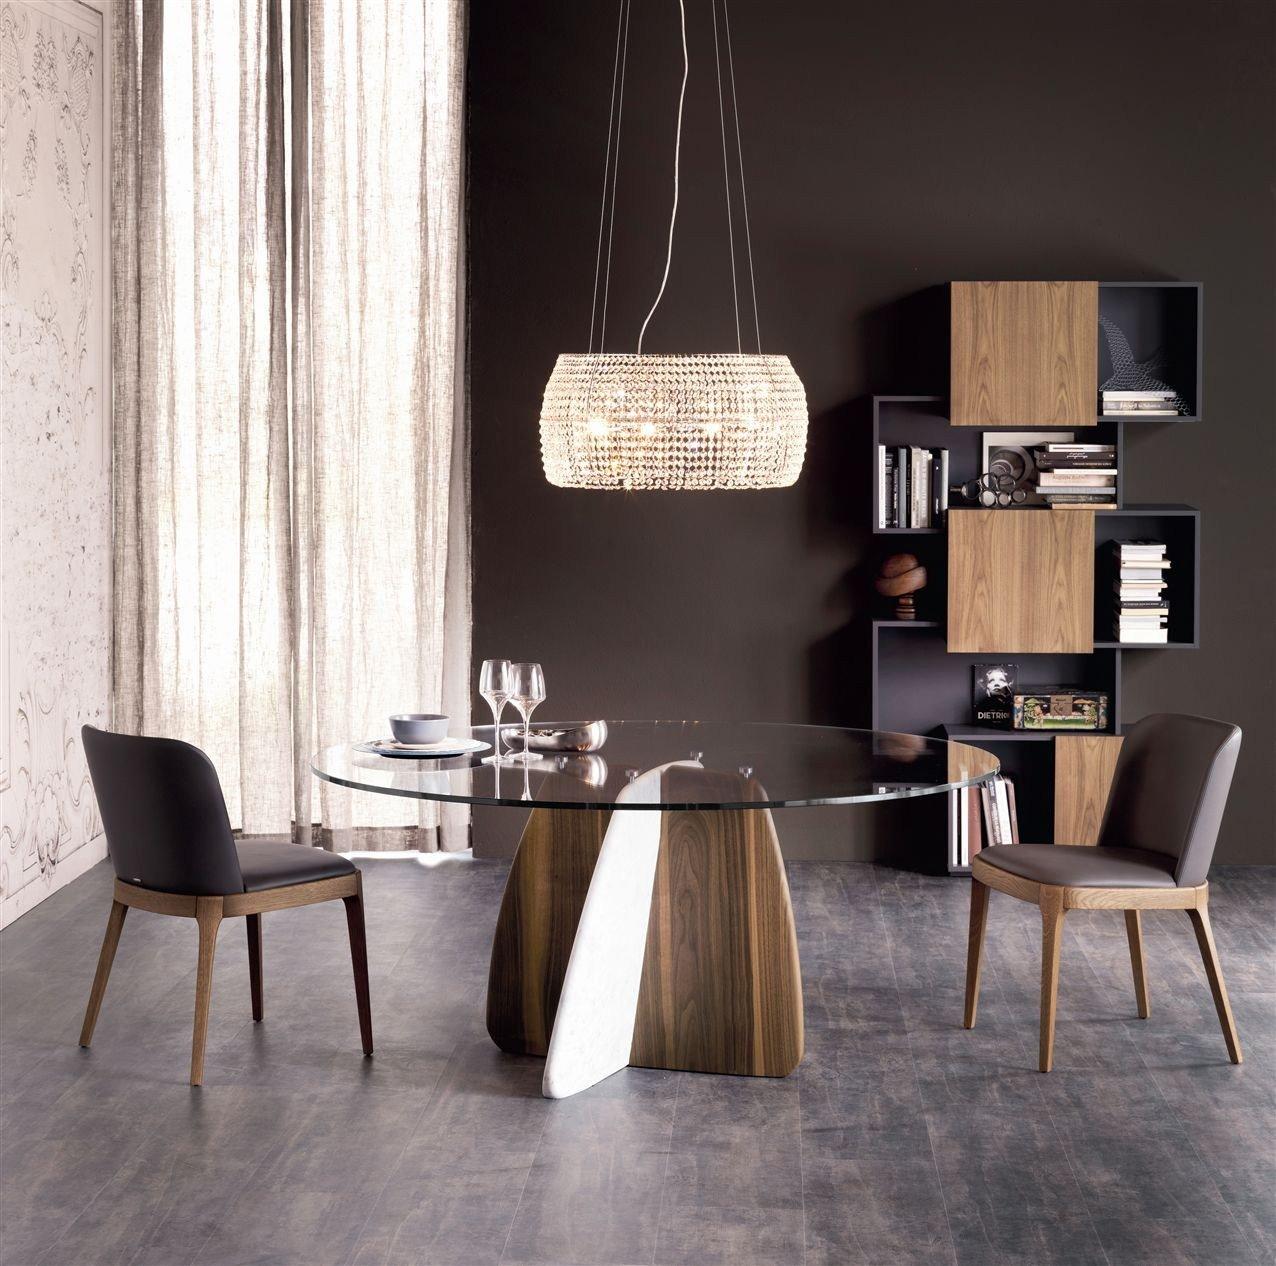 Gusto moderno e ricercato per cattelan italia ai saloni for Cattelan italia